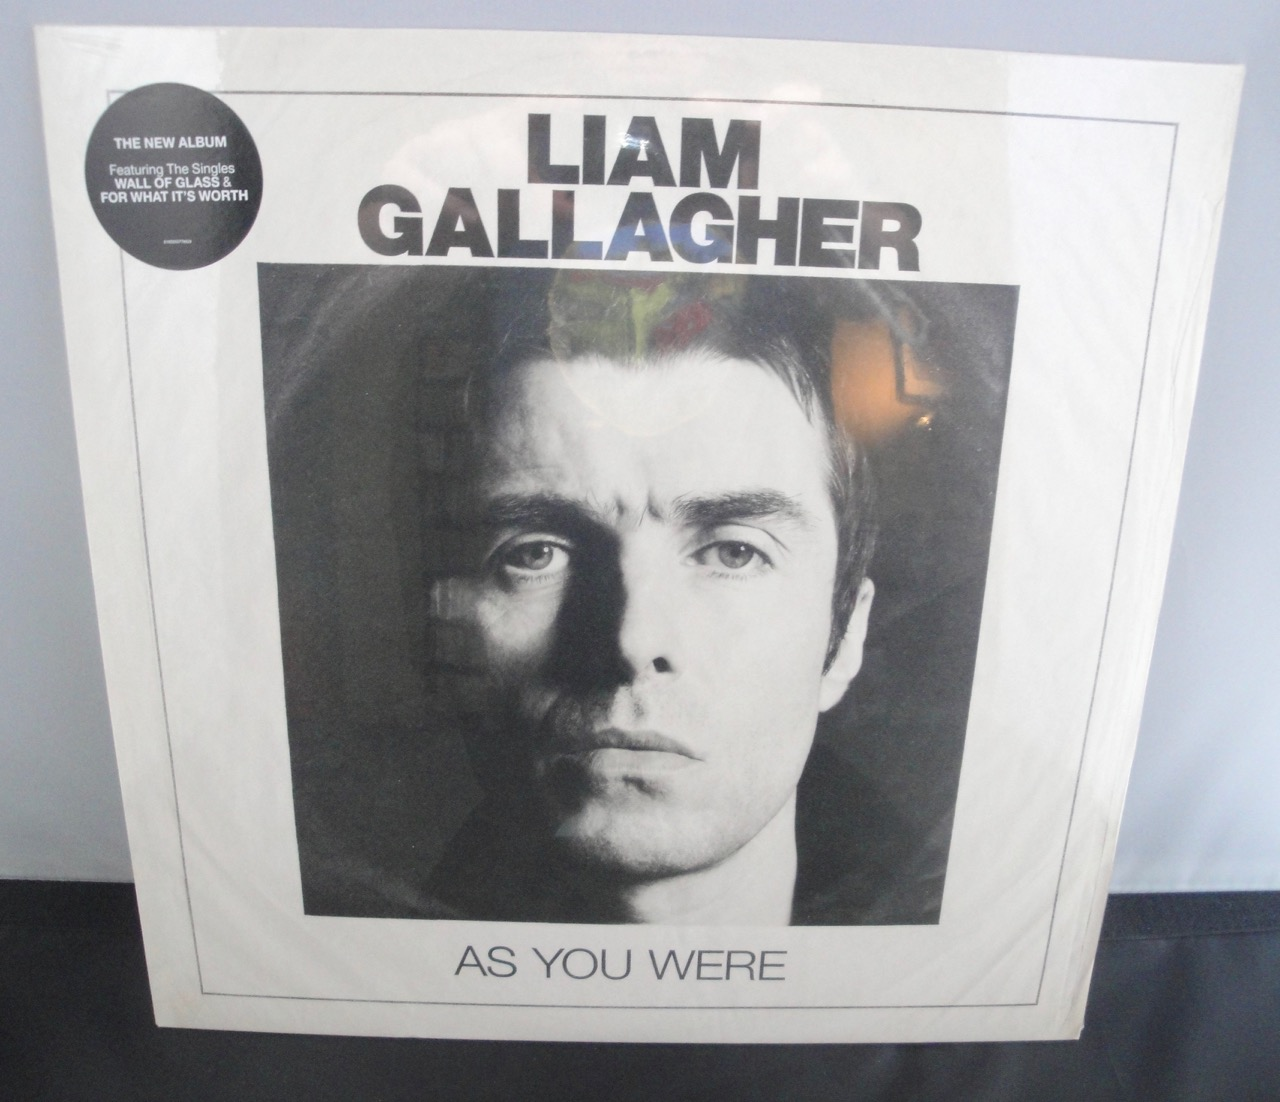 Liam Gallagher - As You Were - White, 180 Gram Vinyl, Indie Exclusive 2017